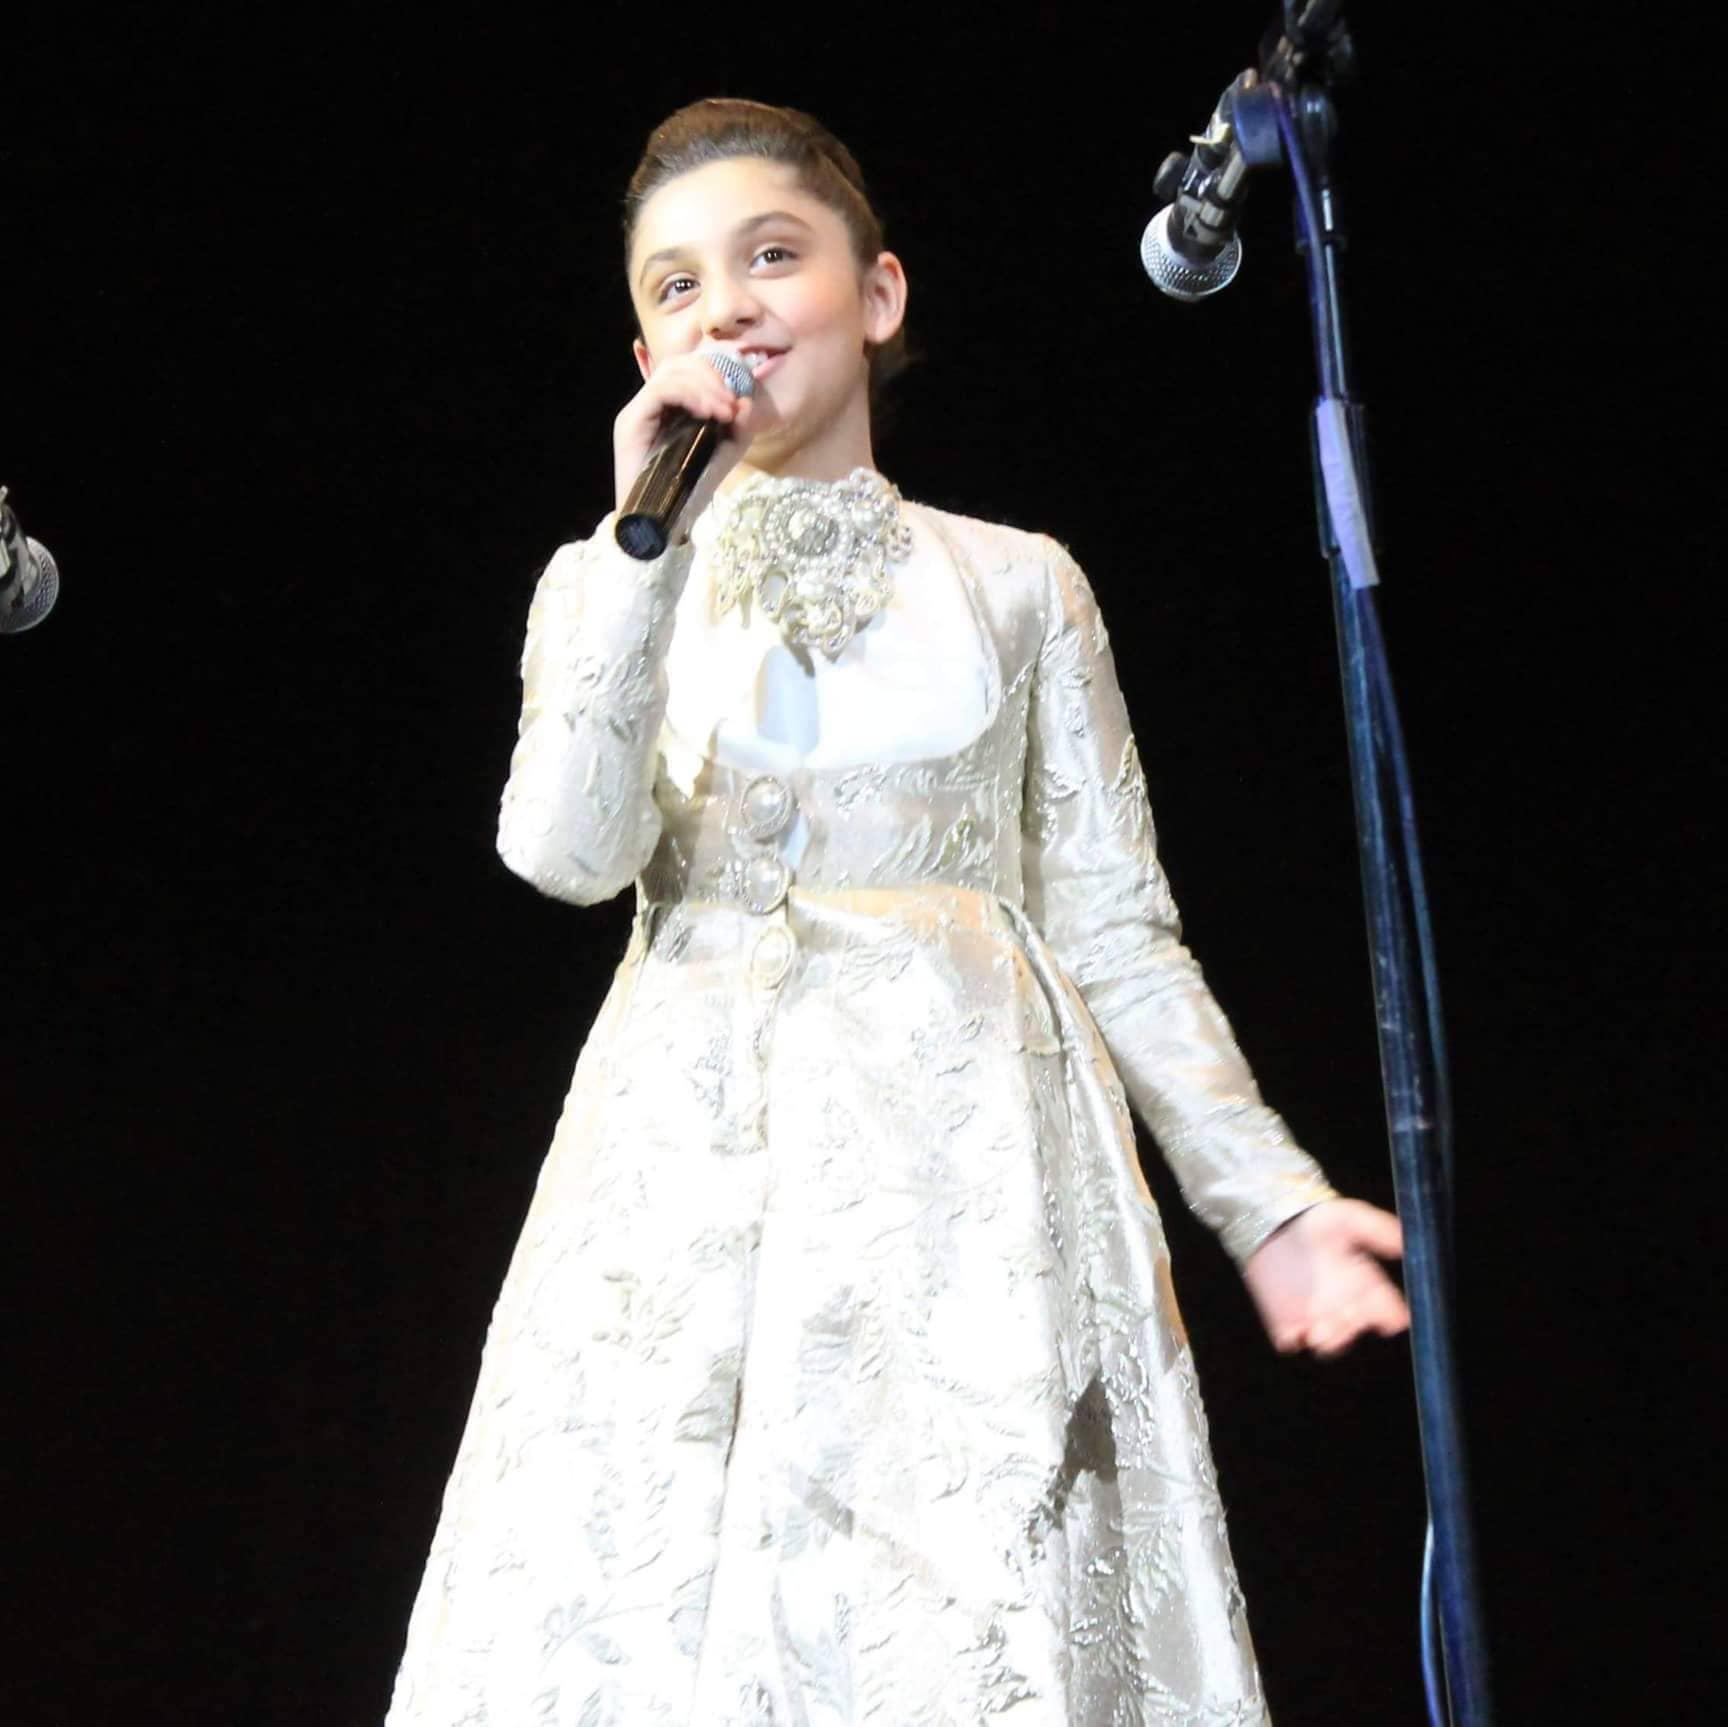 11 let - Elene Talabadze,- Gruzie